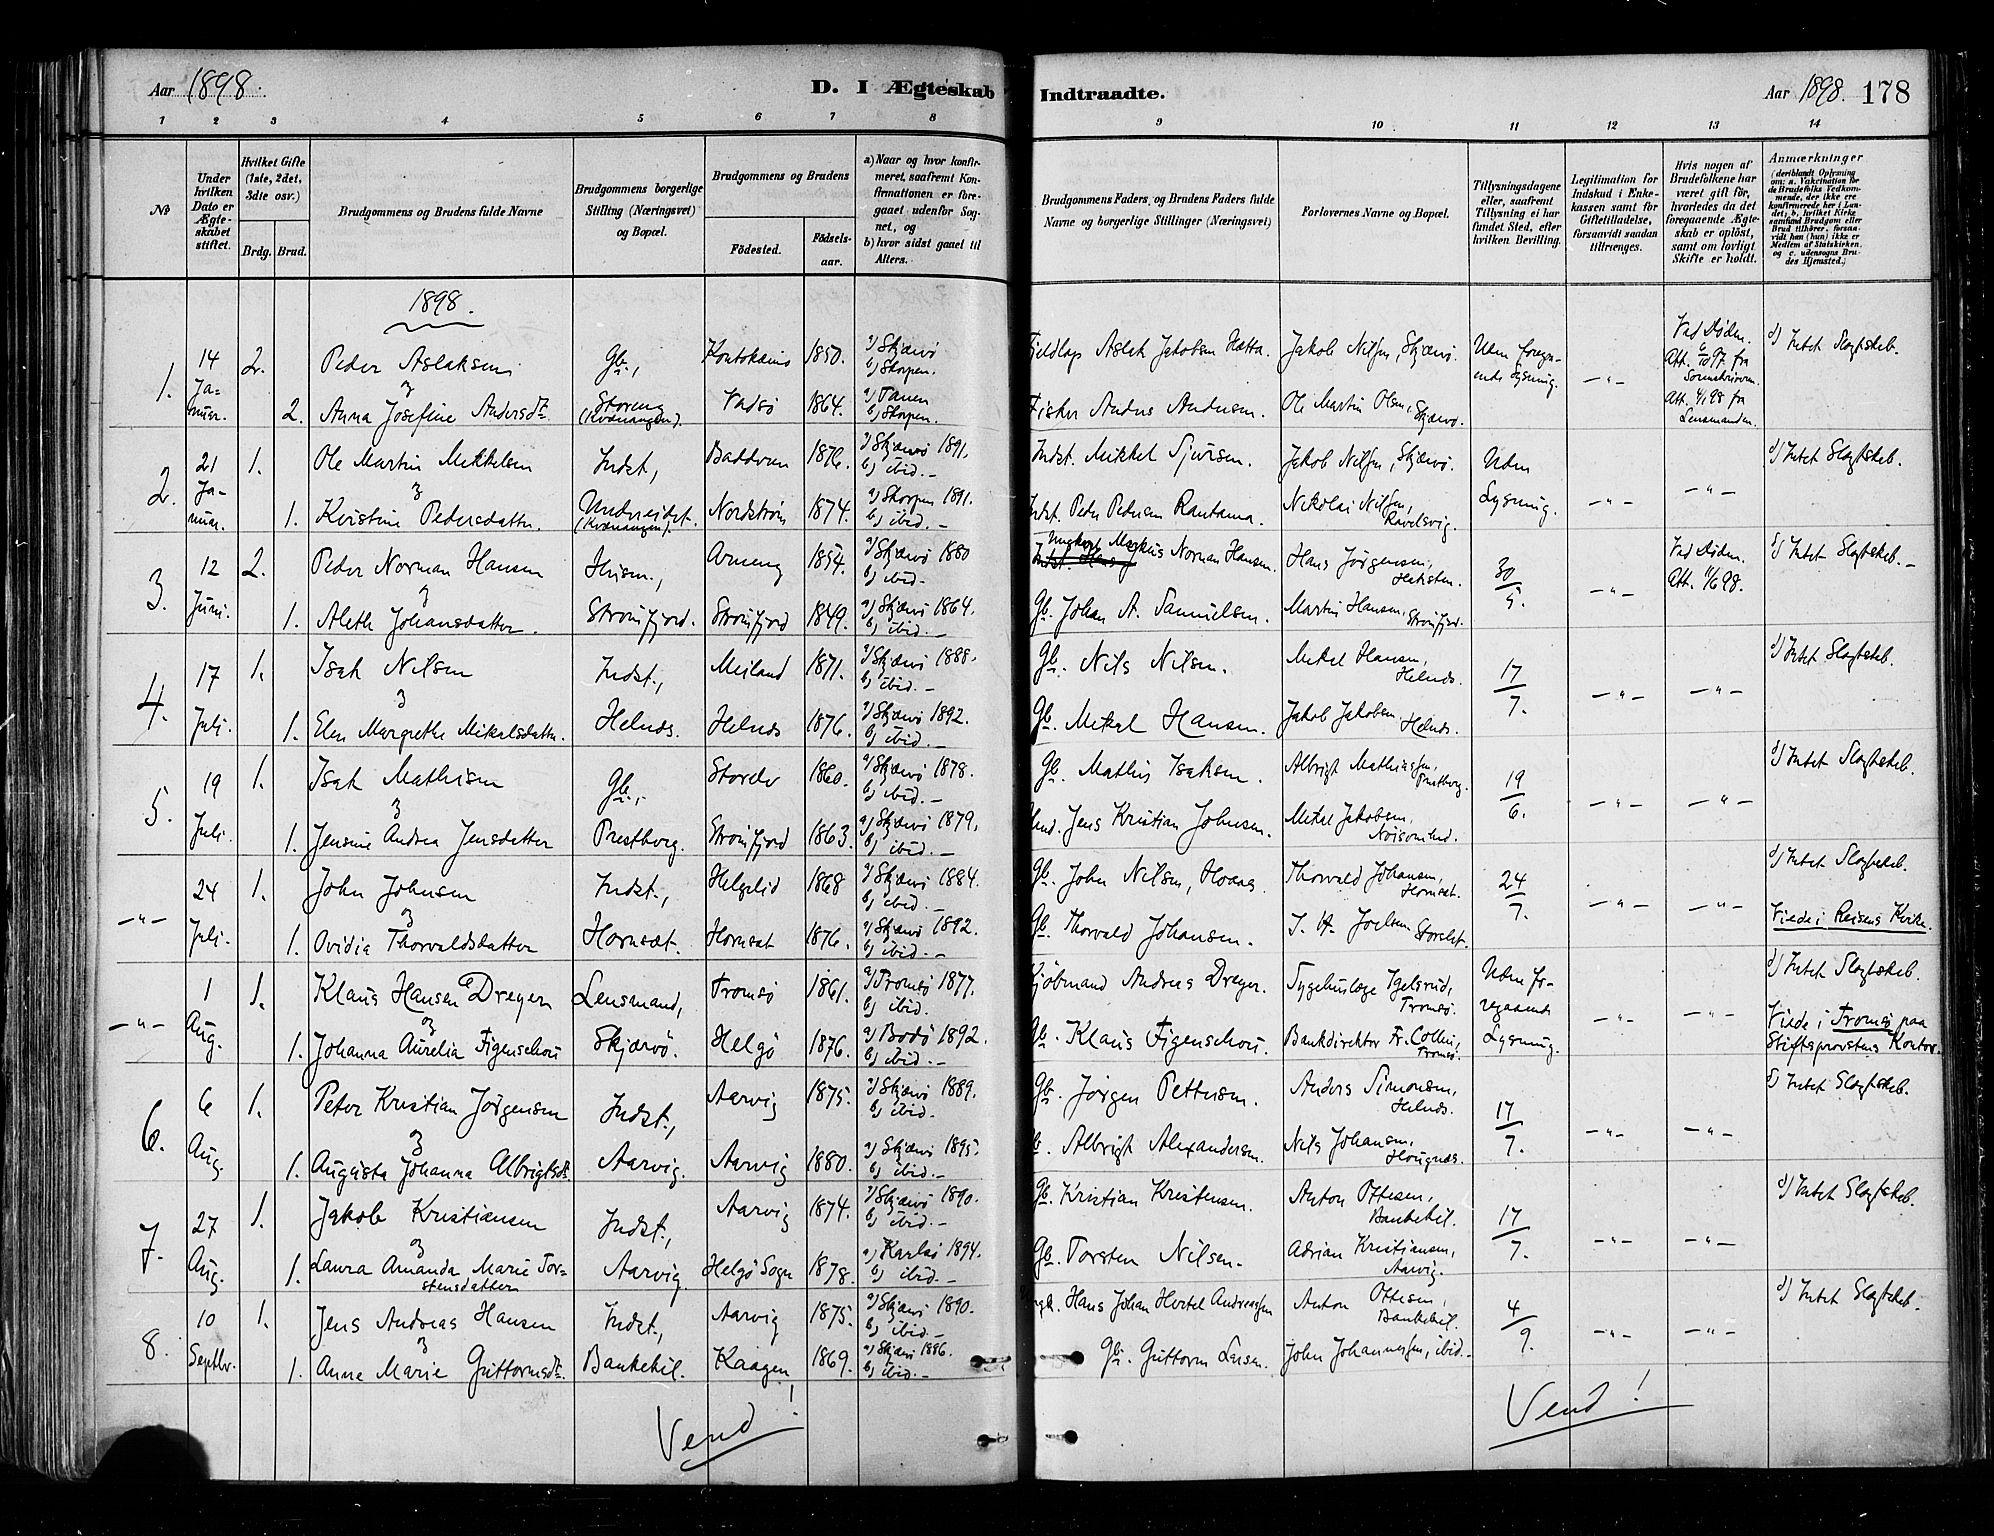 SATØ, Skjervøy sokneprestkontor, H/Ha/Haa/L0010kirke: Ministerialbok nr. 10, 1887-1898, s. 178